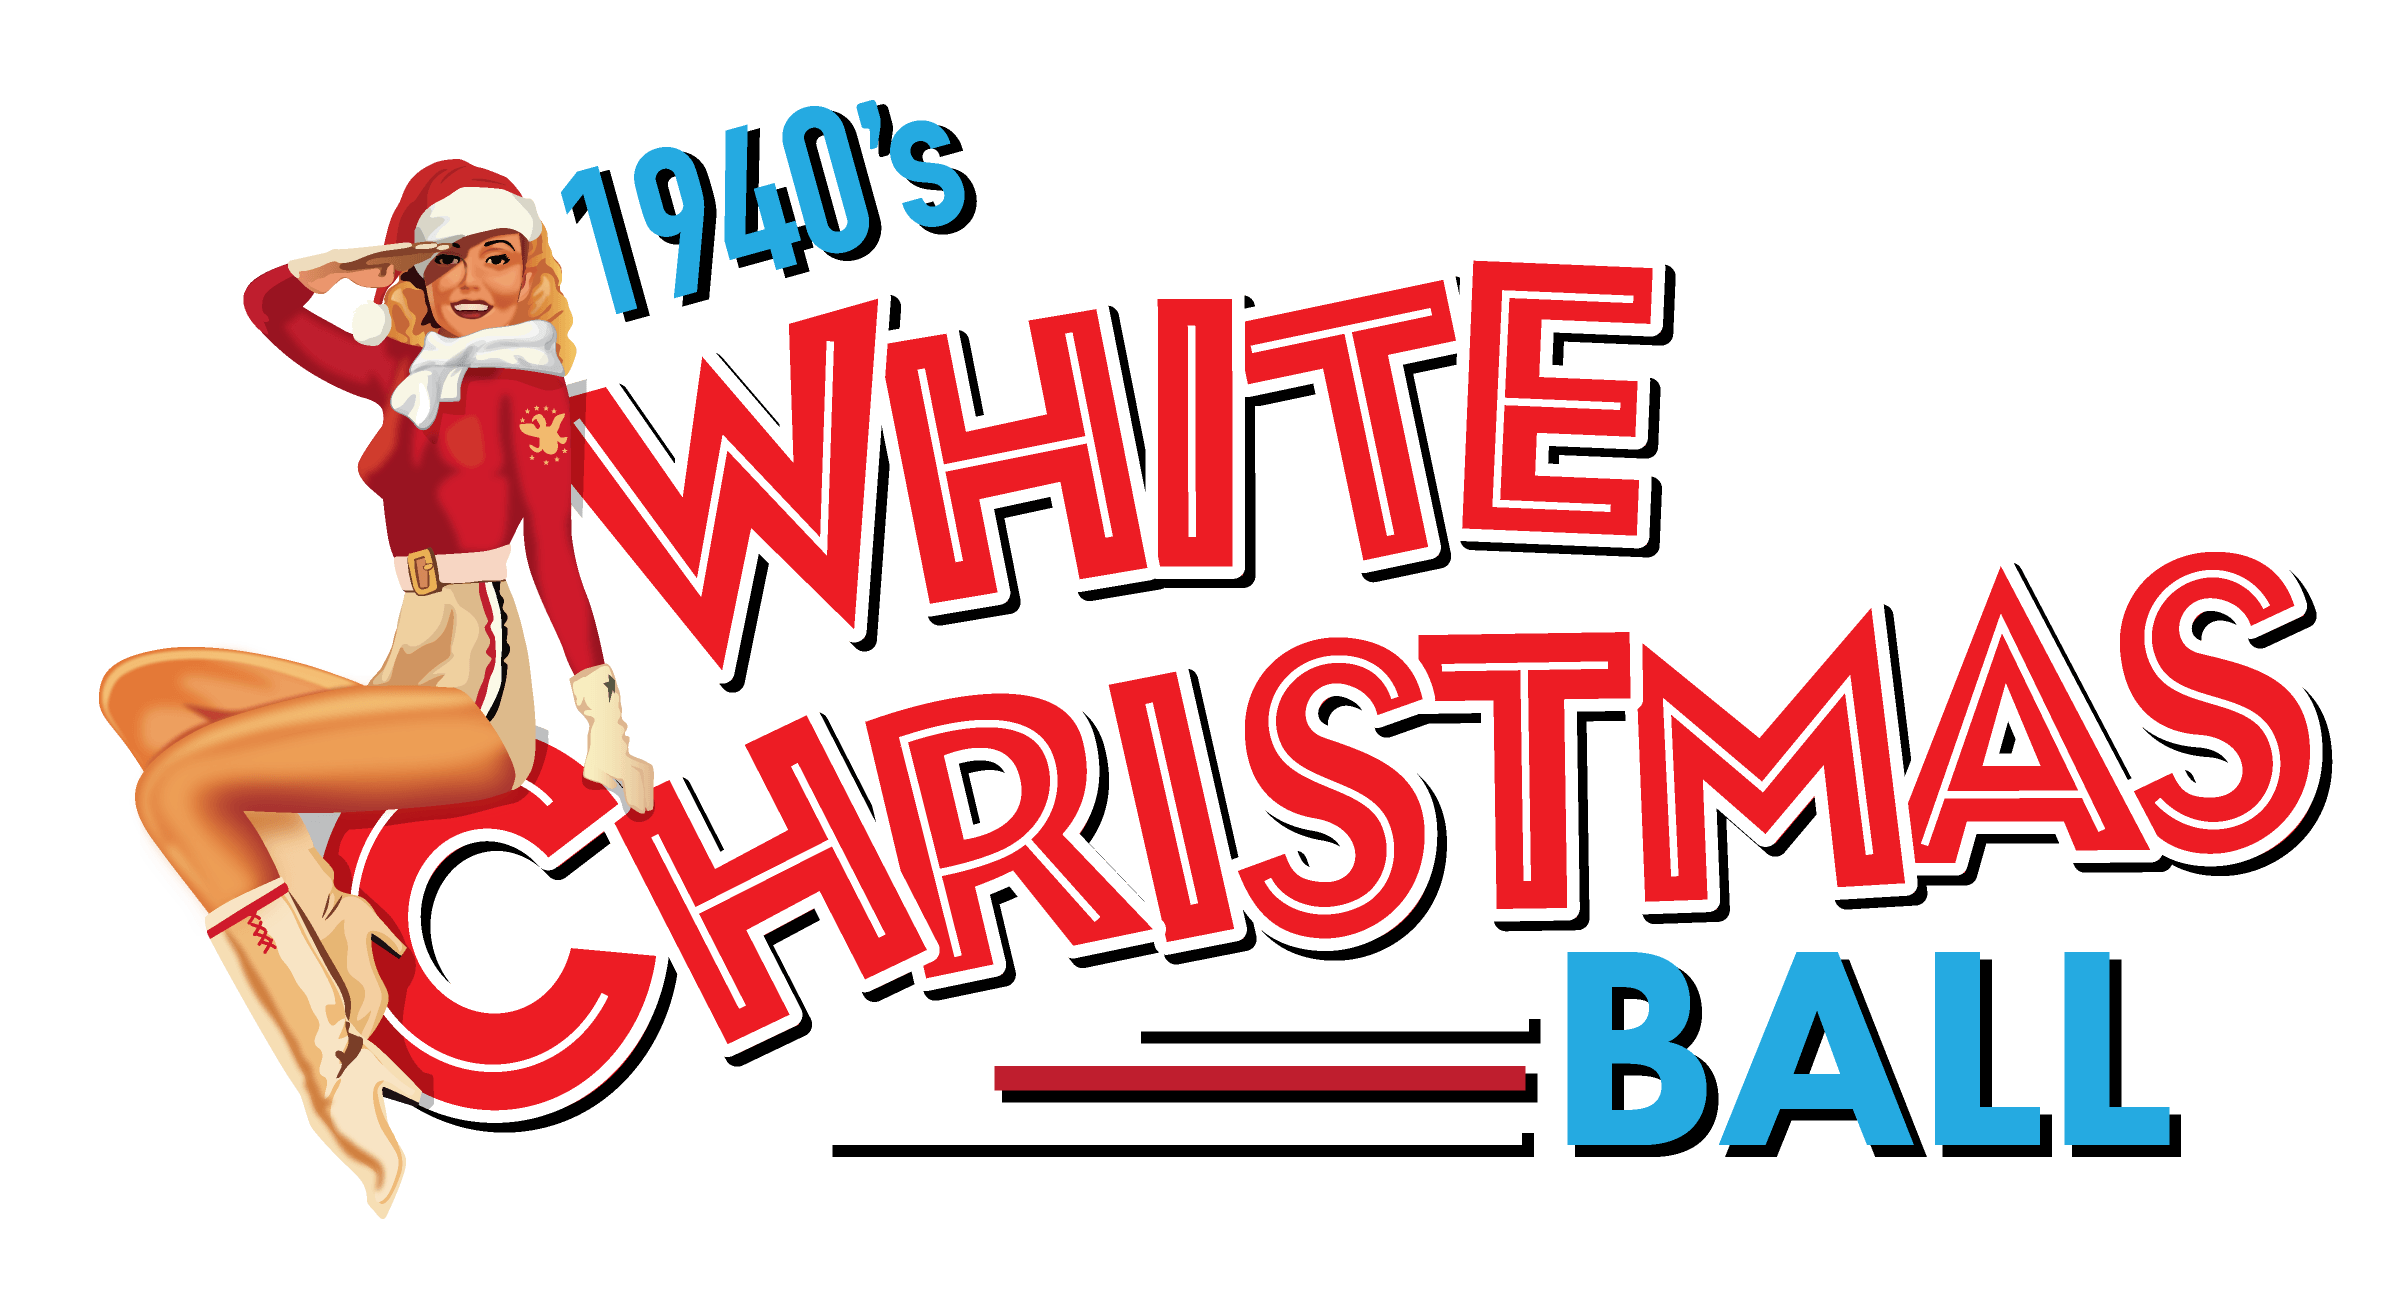 1940s White Christmas Ball logo